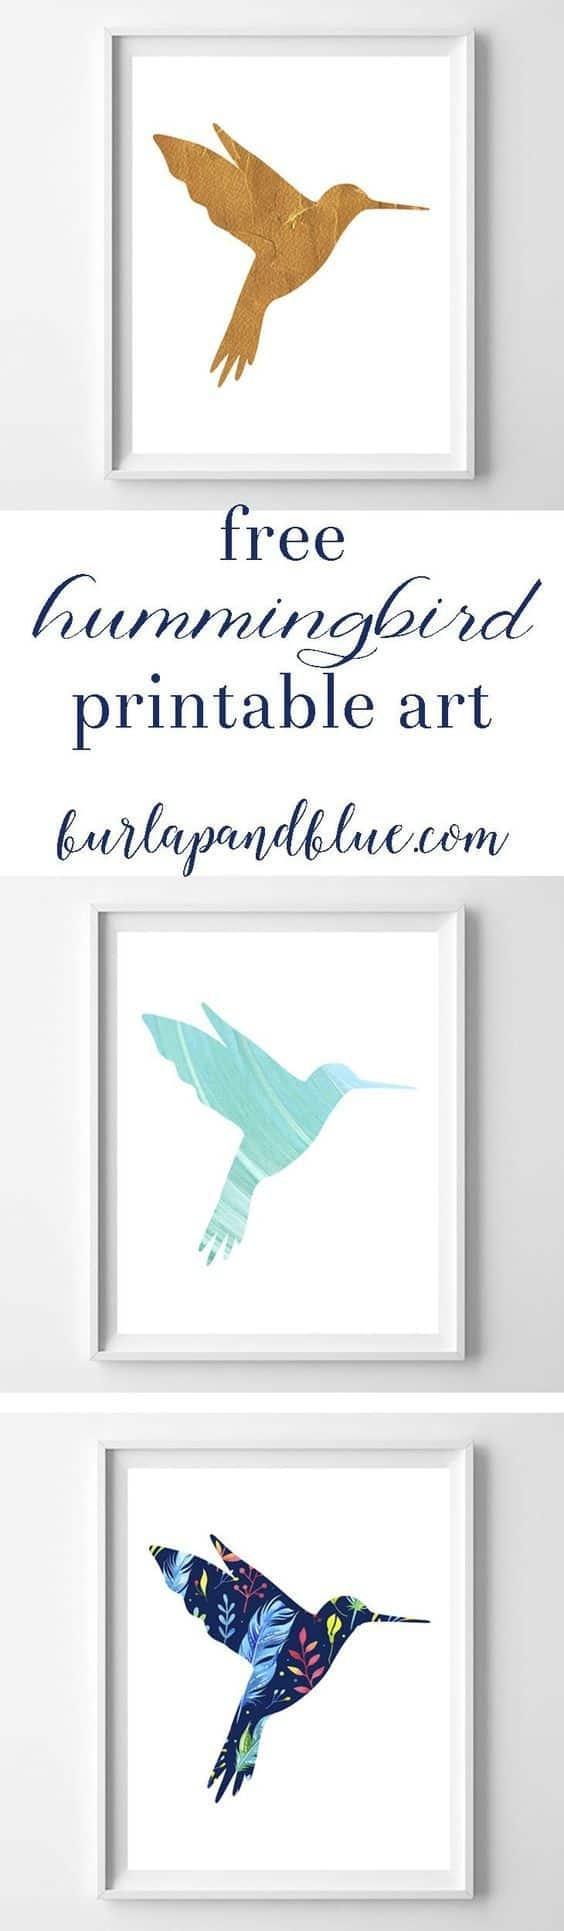 Hummingbird Art {3 Free Printable Designs} - Free Printable Pictures Of Hummingbirds